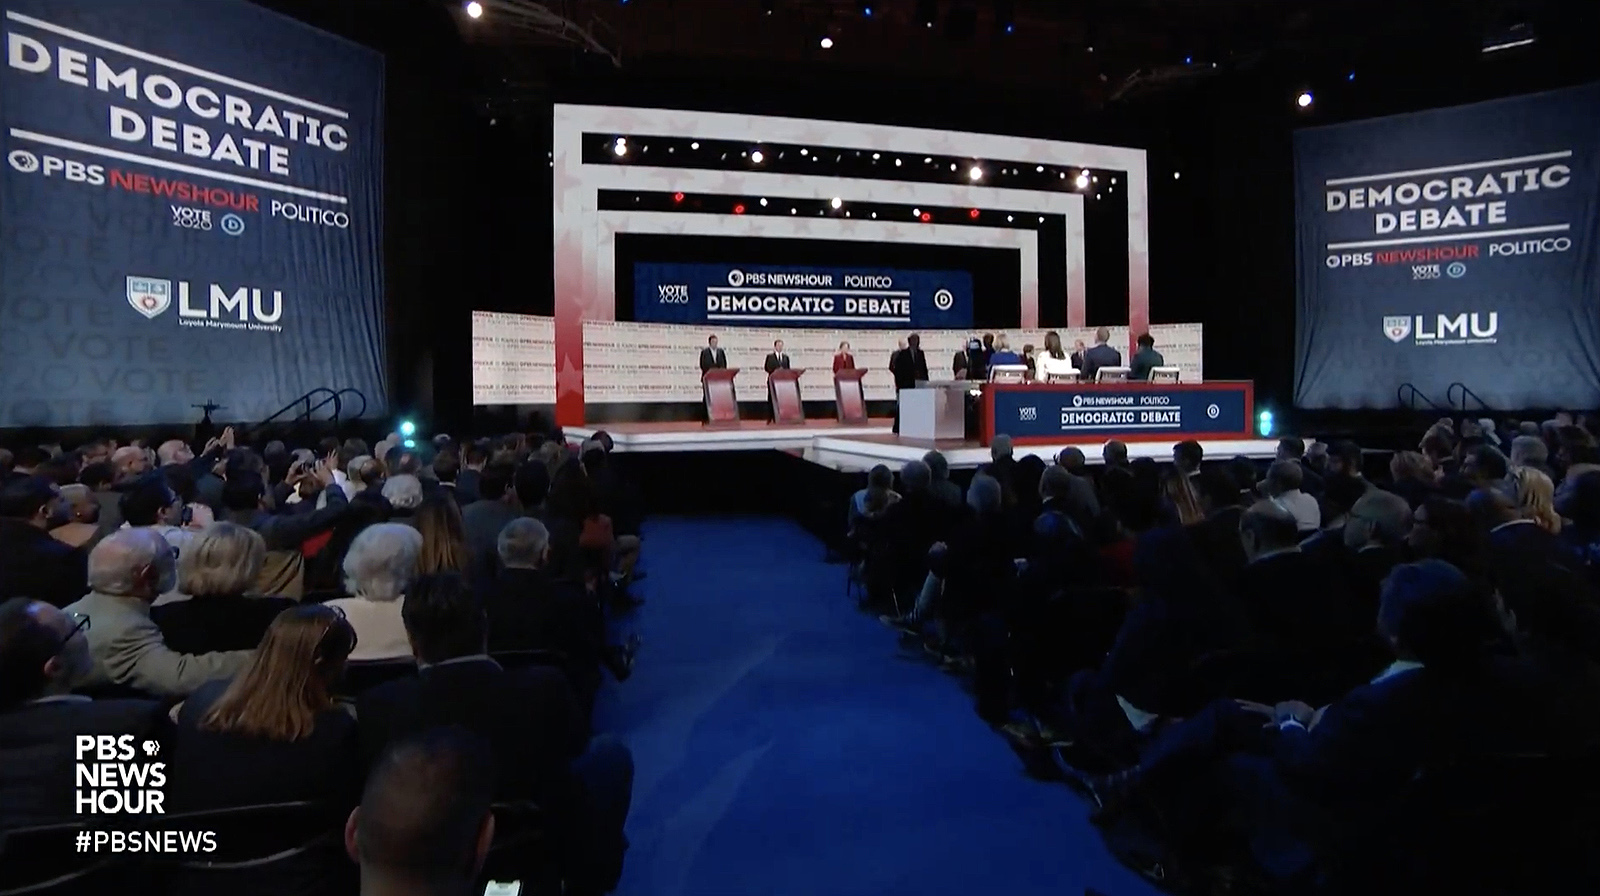 NCS_PBS-NewsHour_Politico_Democratic-Debate_005